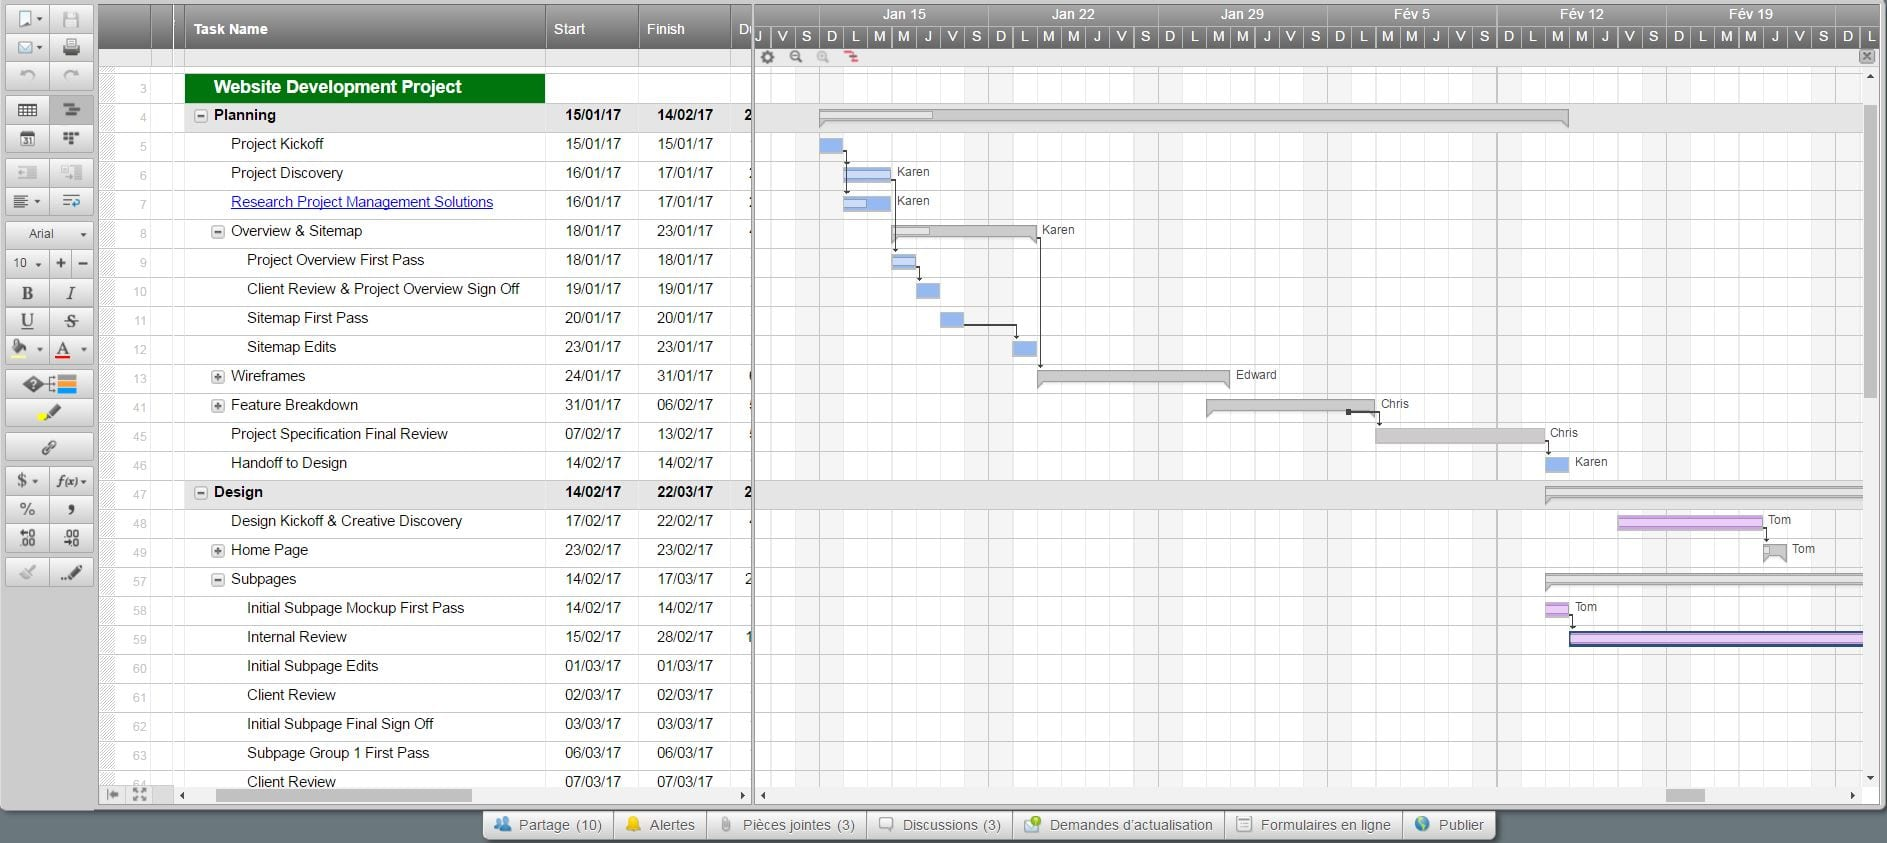 Google Docs Timeline Template Timeline Spreadsheet Template Spreadsheet Templates for Busines Spreadsheet Templates for Busines Excel Project Timeline Template